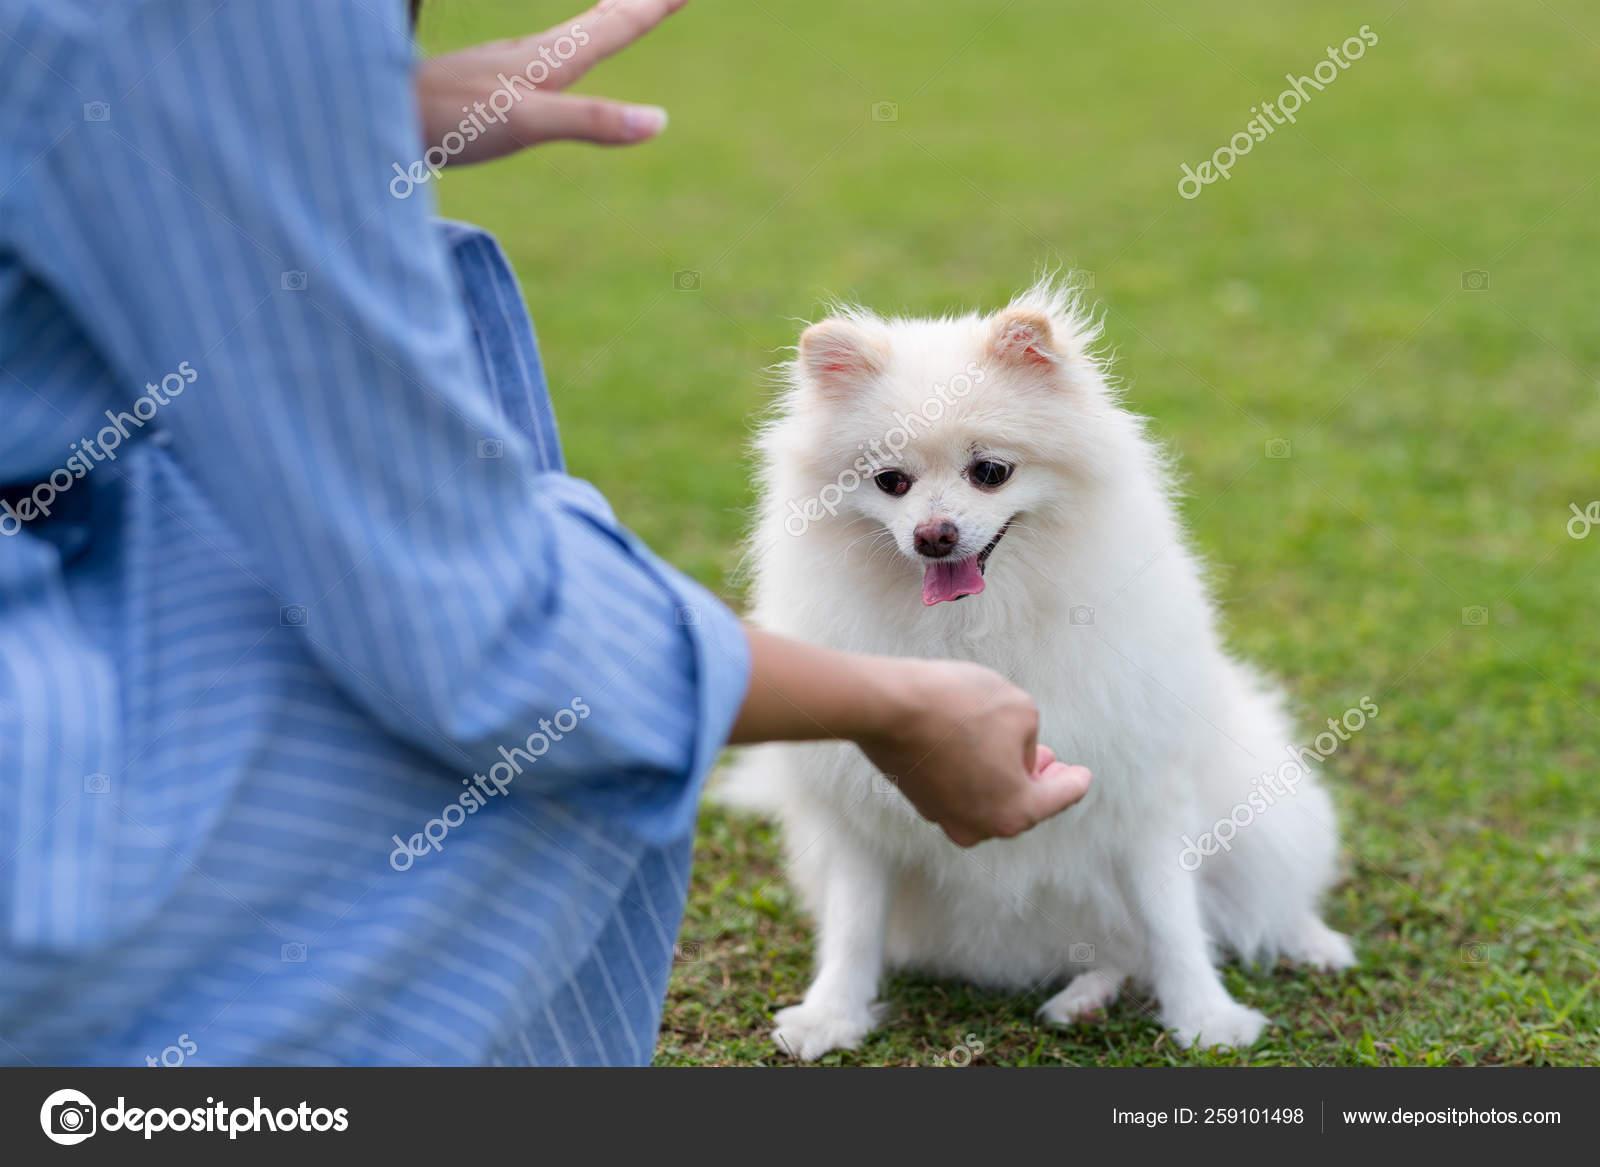 Woman Train On White Pomeranian Dog In The Park Stock Photo C Leungchopan 259101498